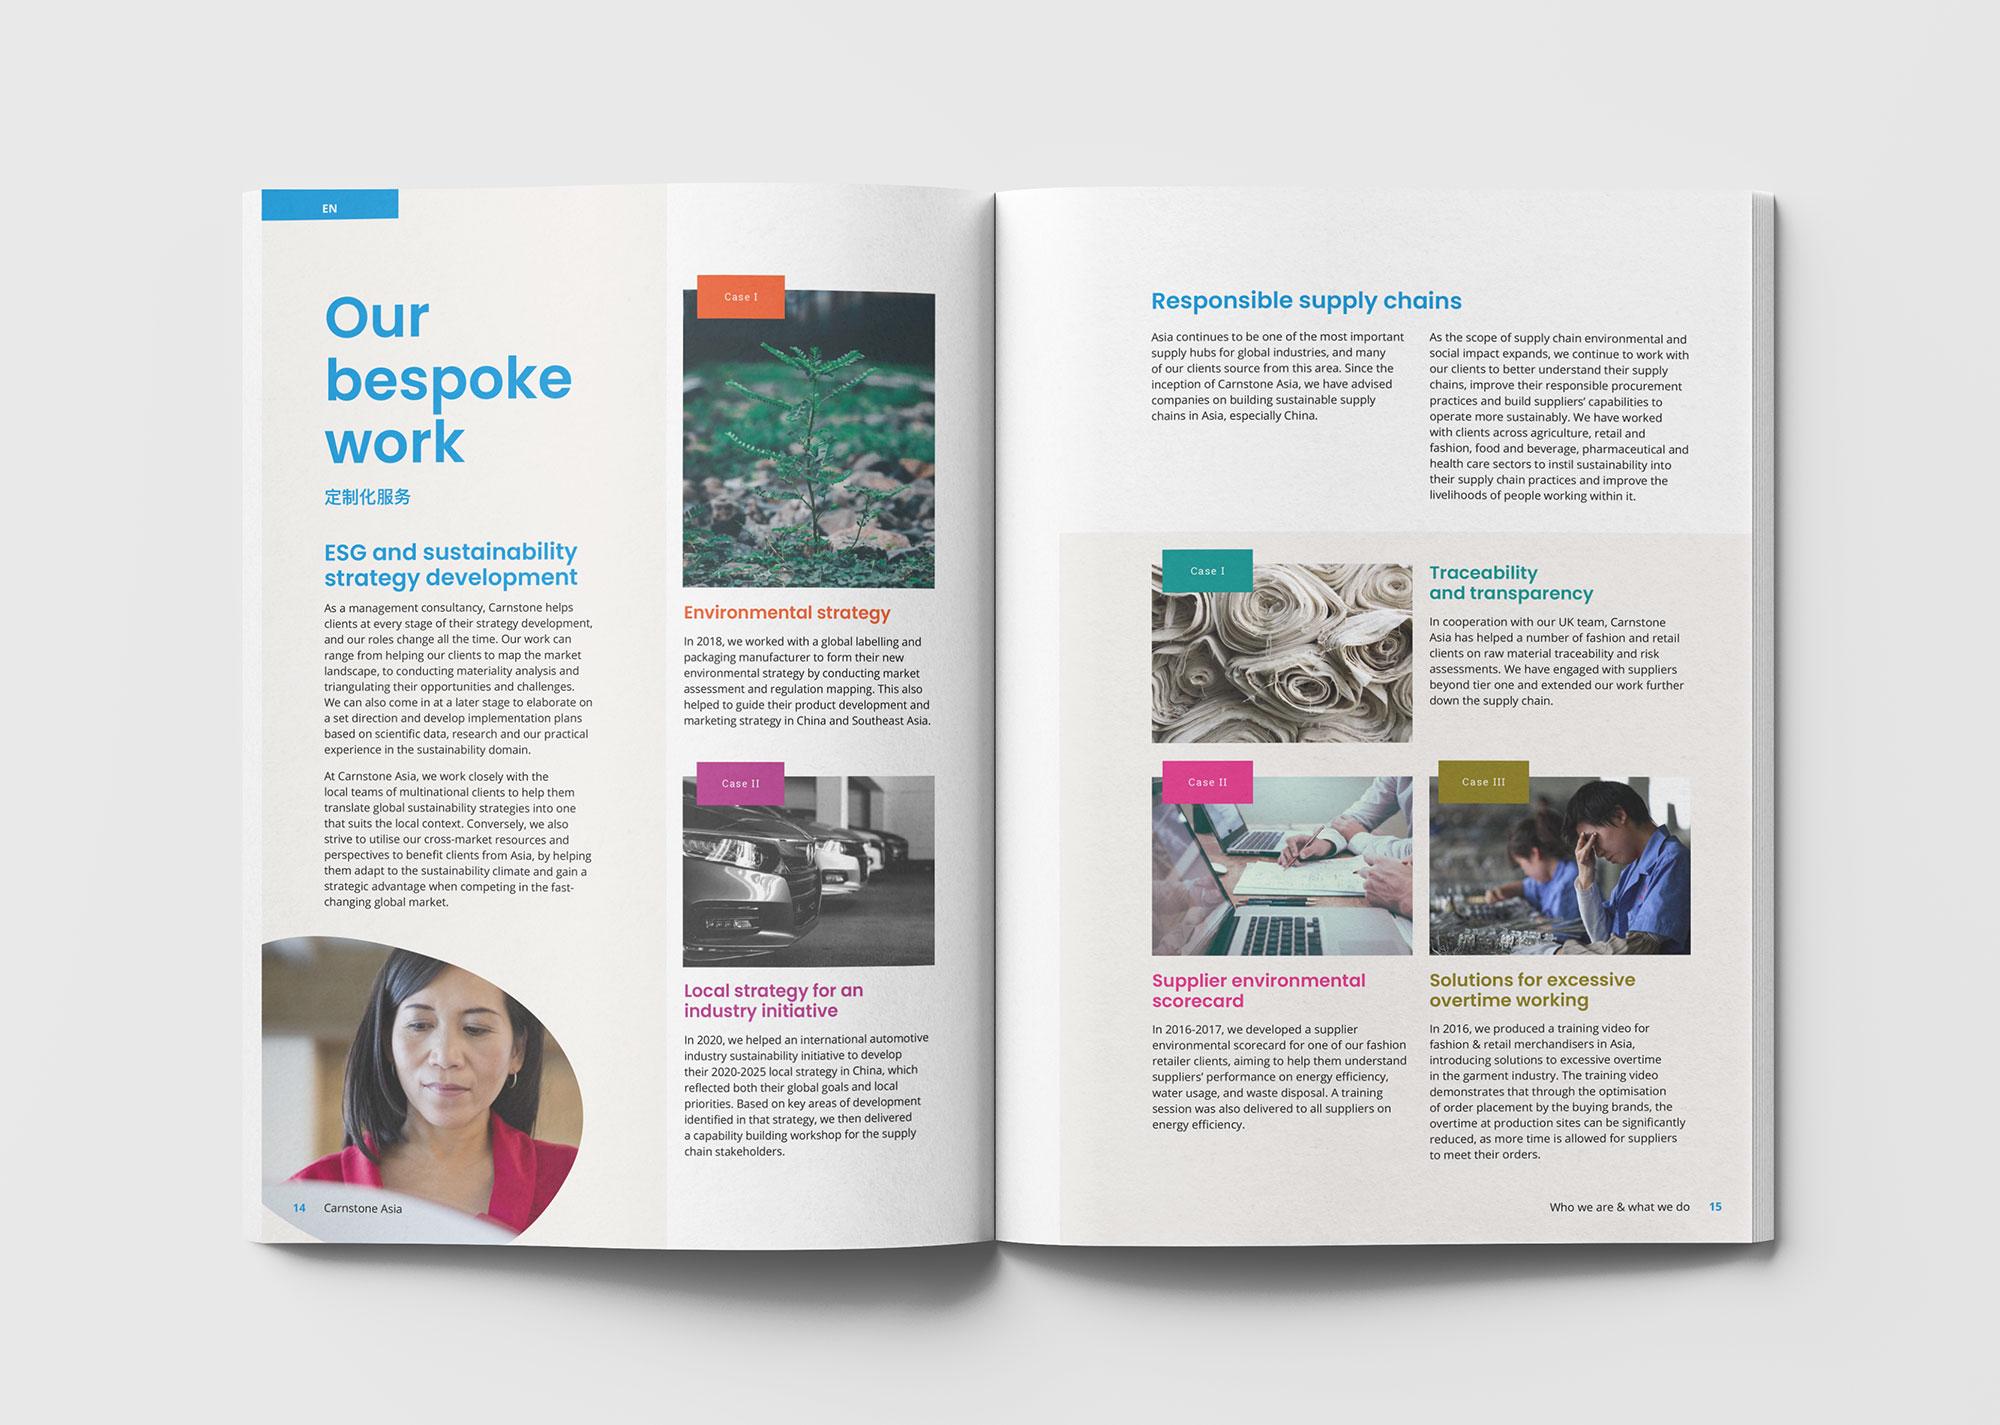 Carnstone Asia bespoke work